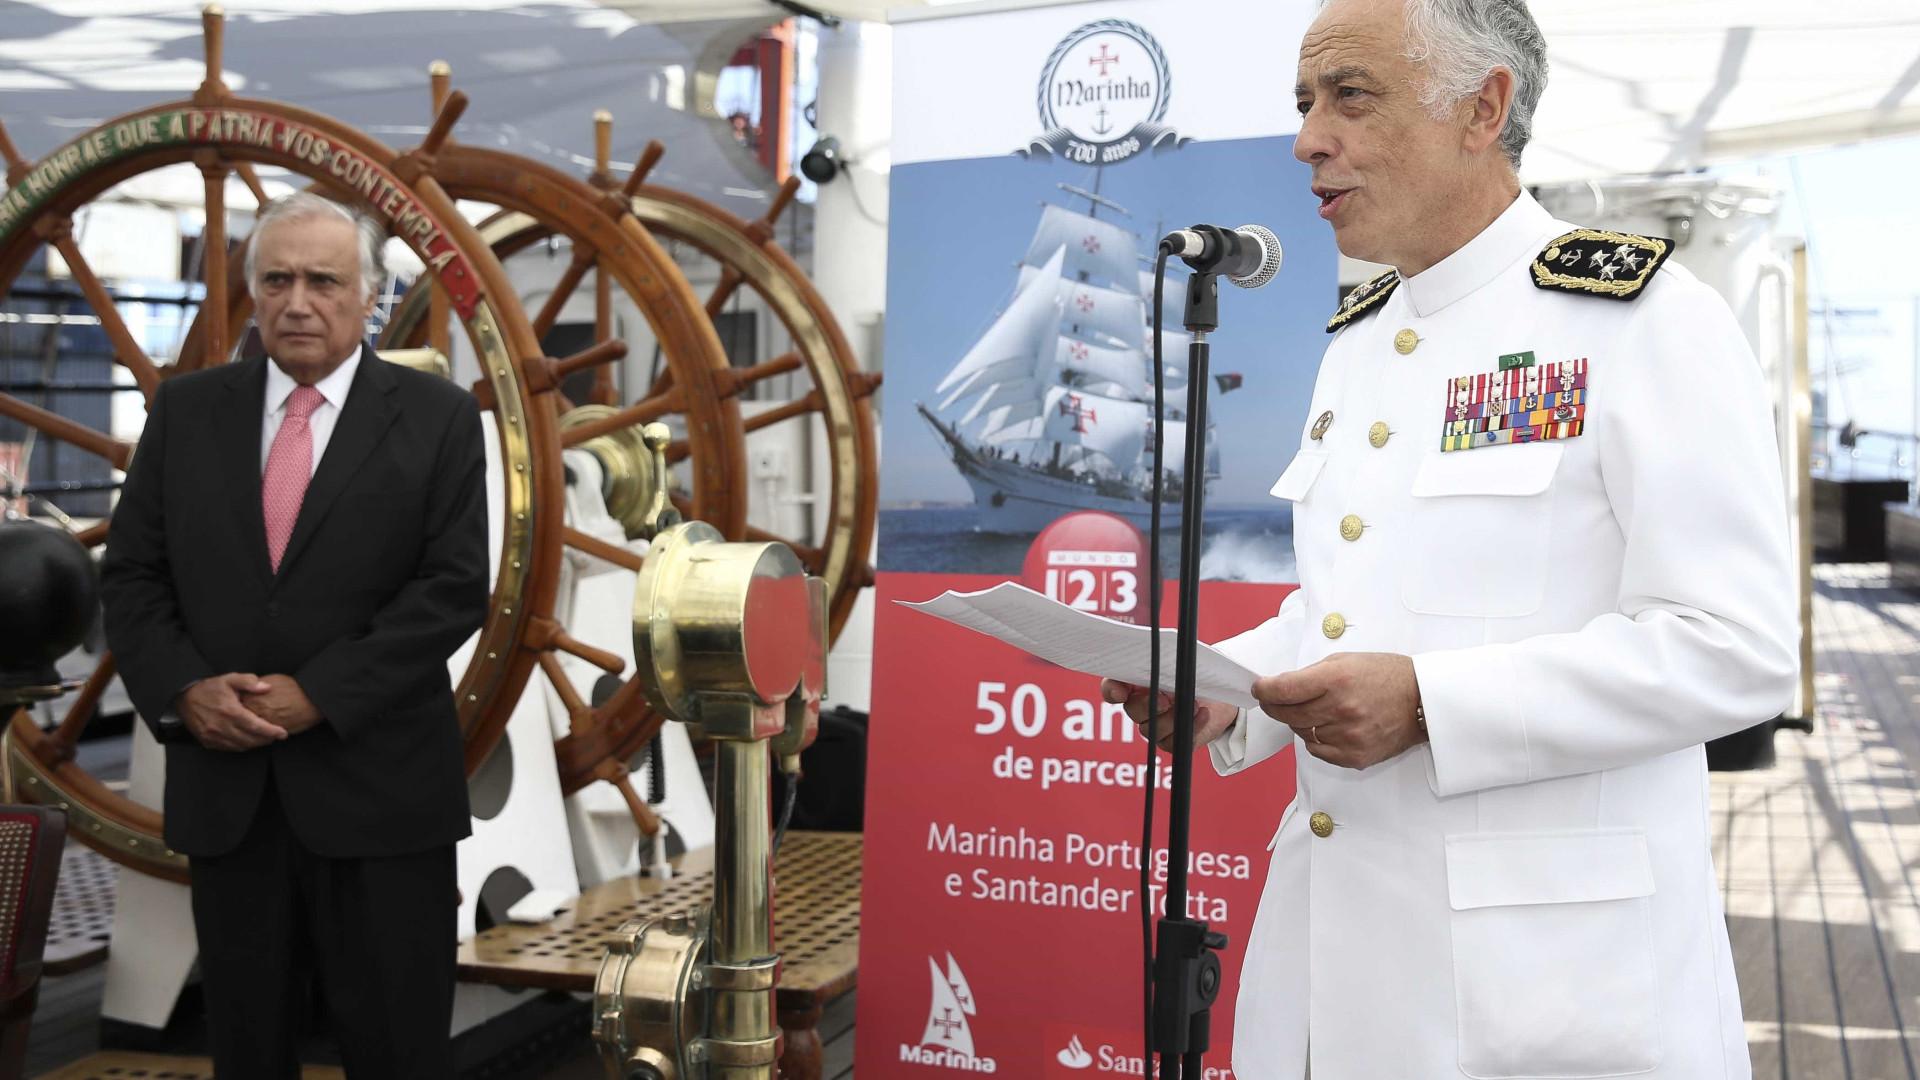 CEMGFA elogia desempenho dos militares portugueses em combate em Bambari